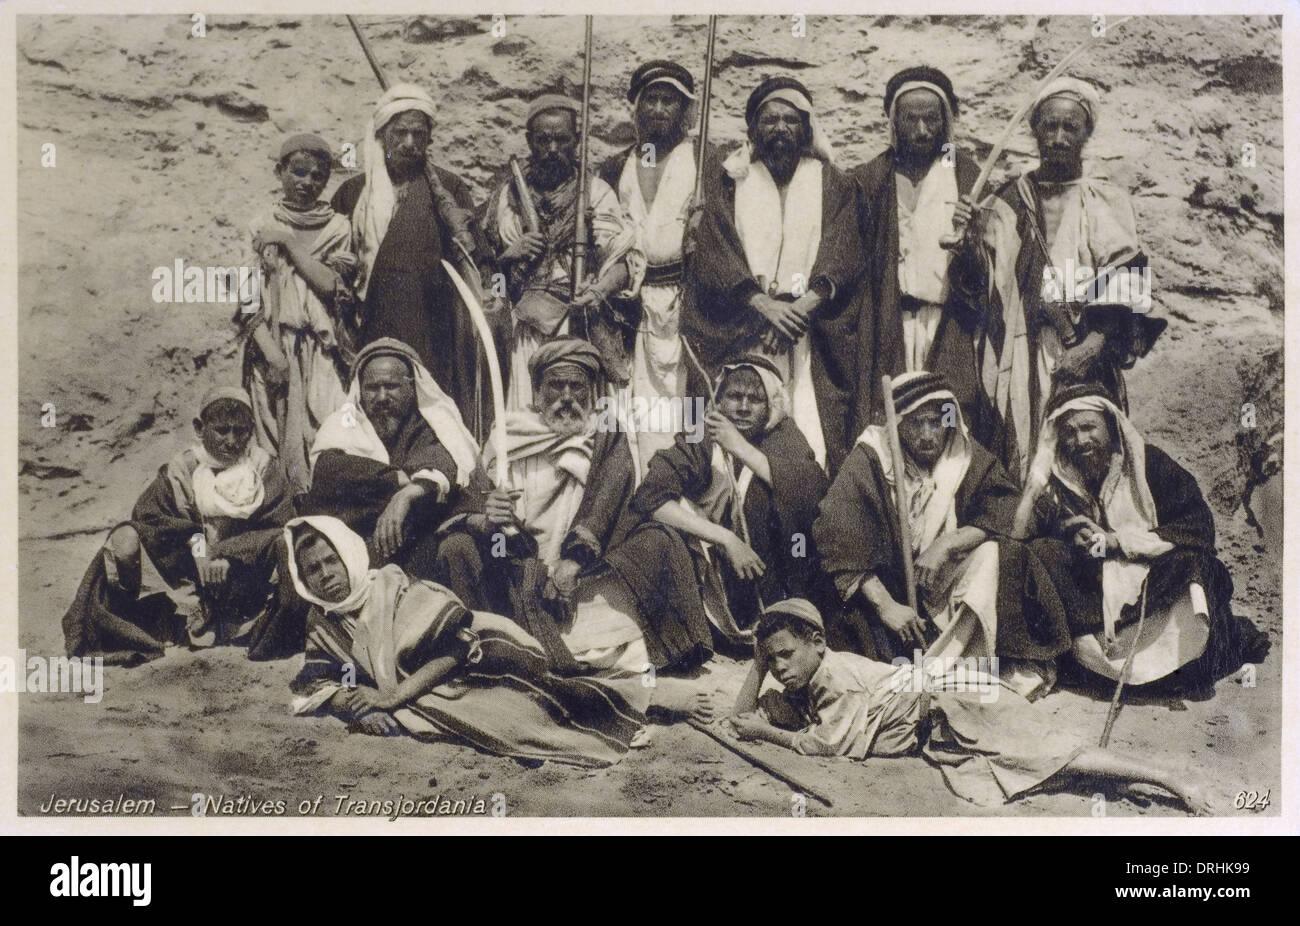 natives of transjordania nr jerusalem israel stock photo